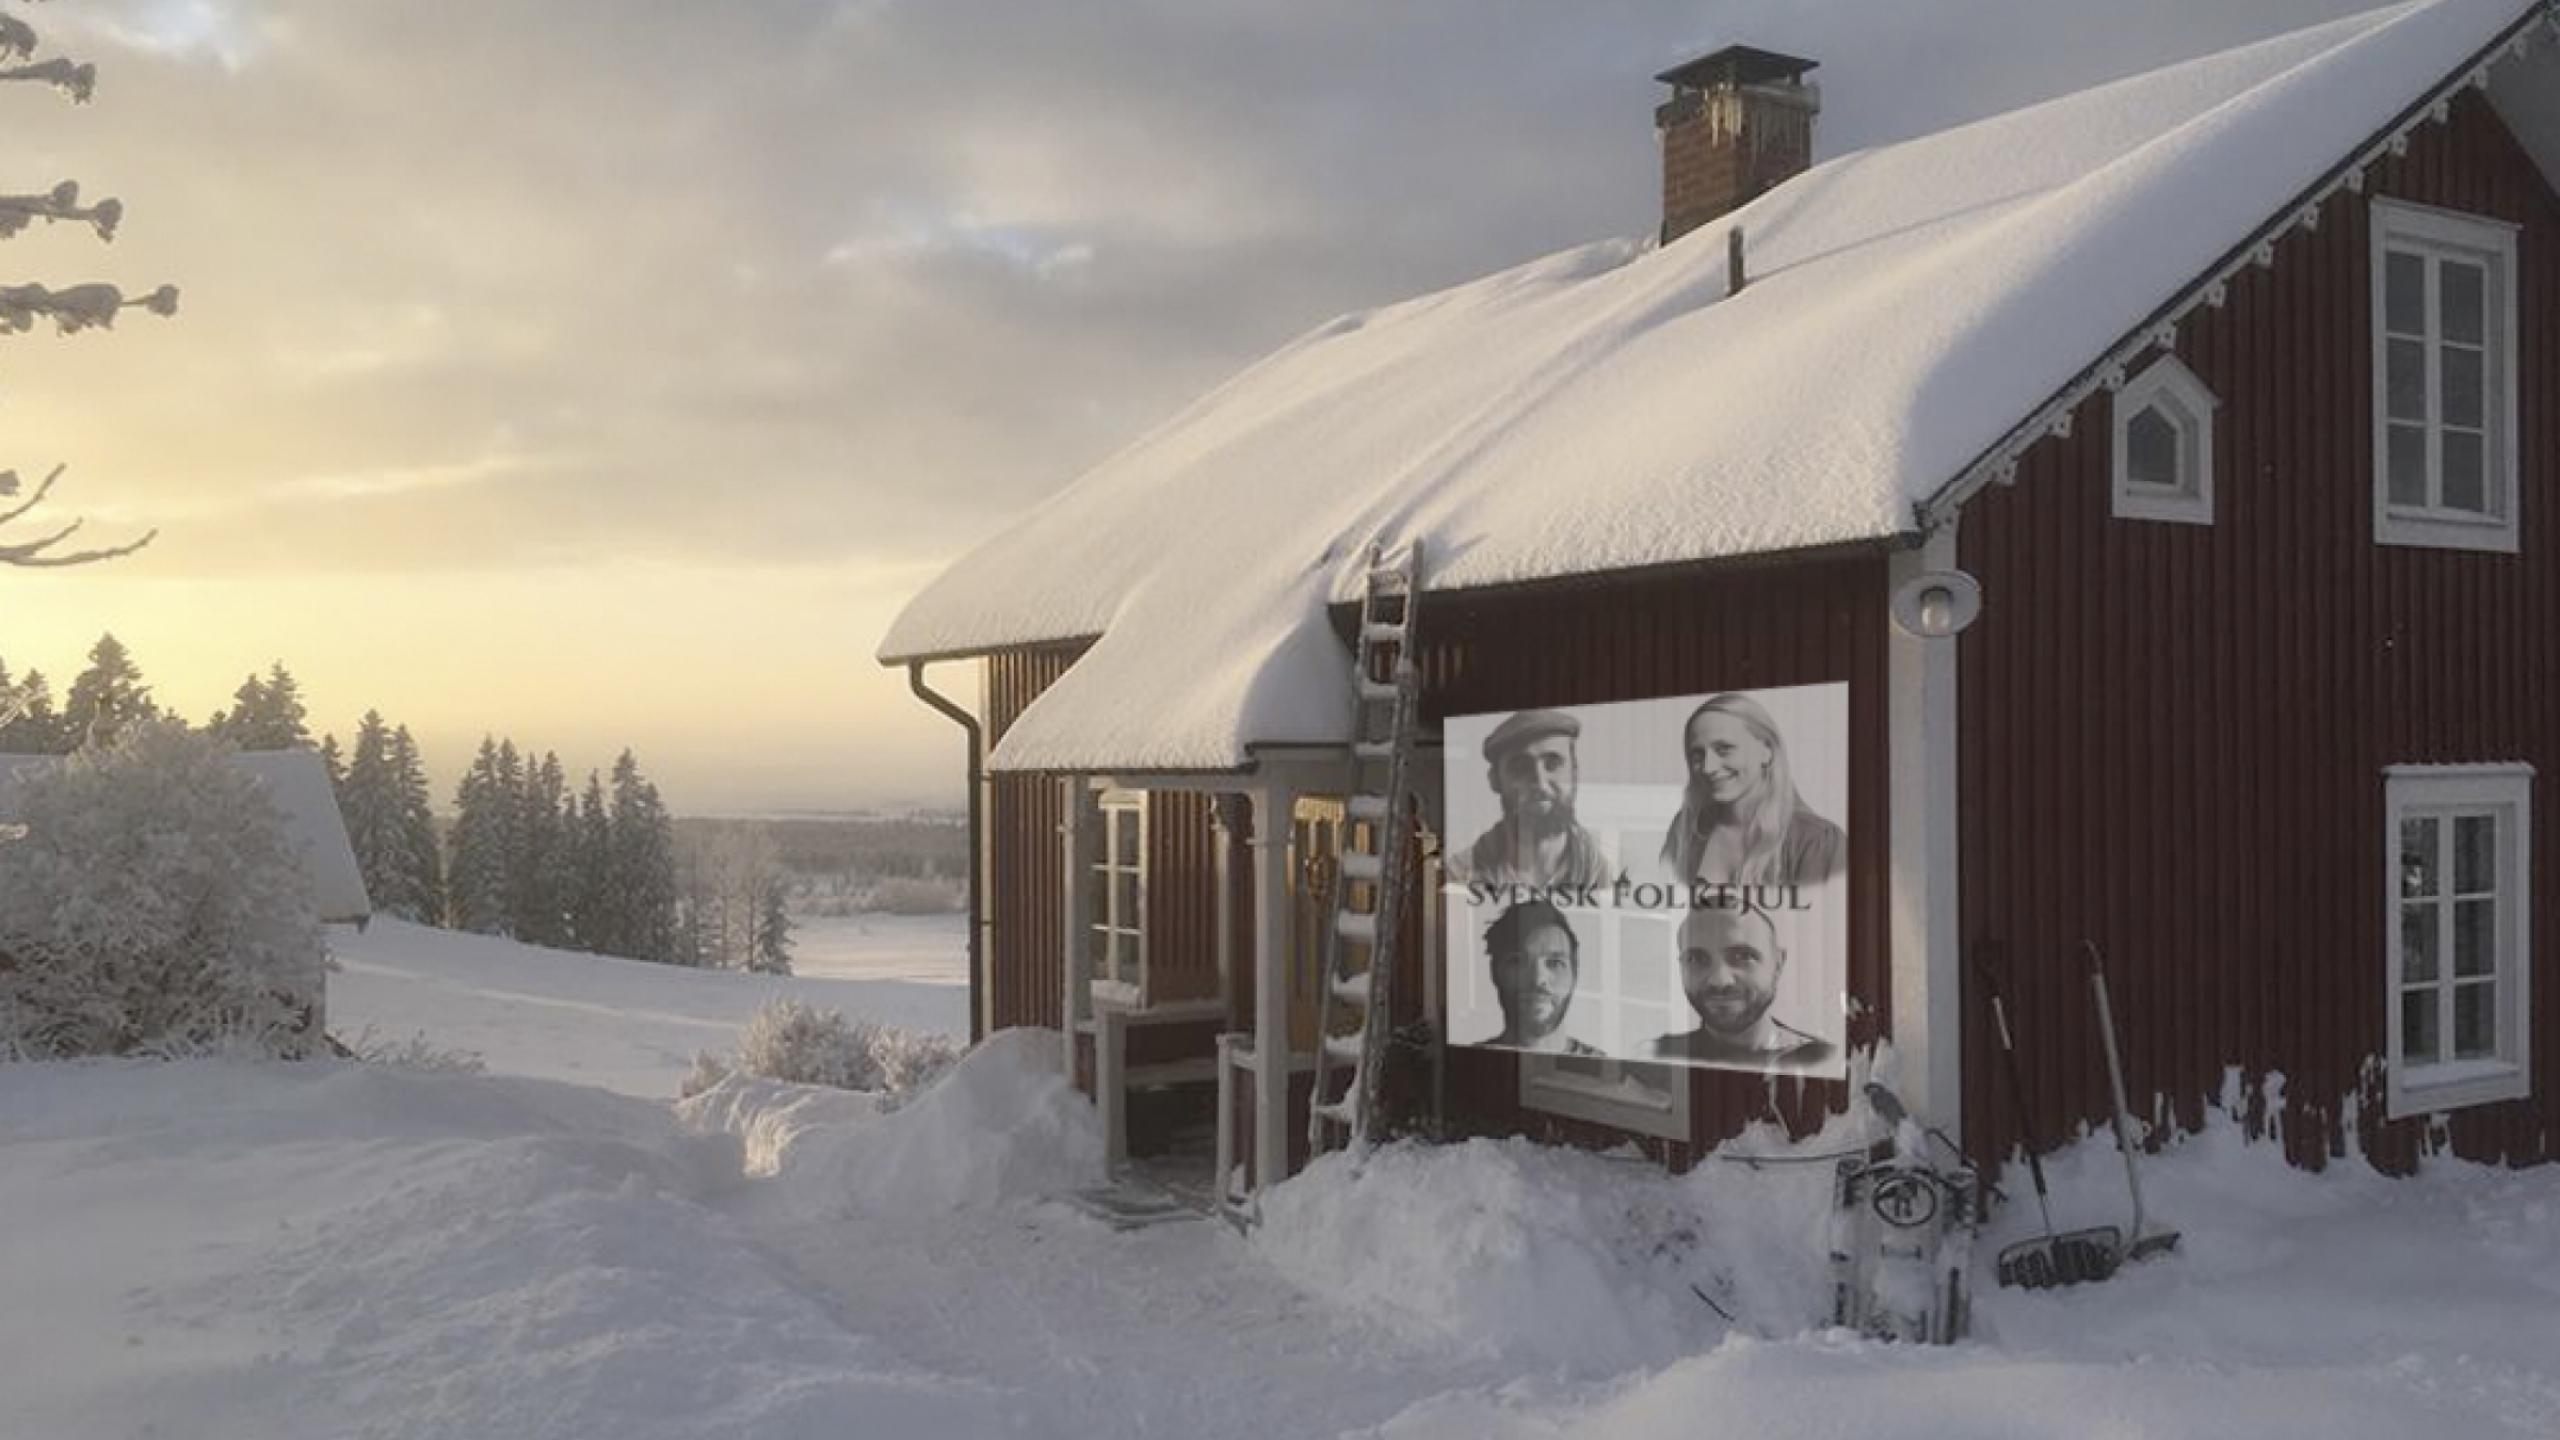 foto_svensk_folkejul_fix